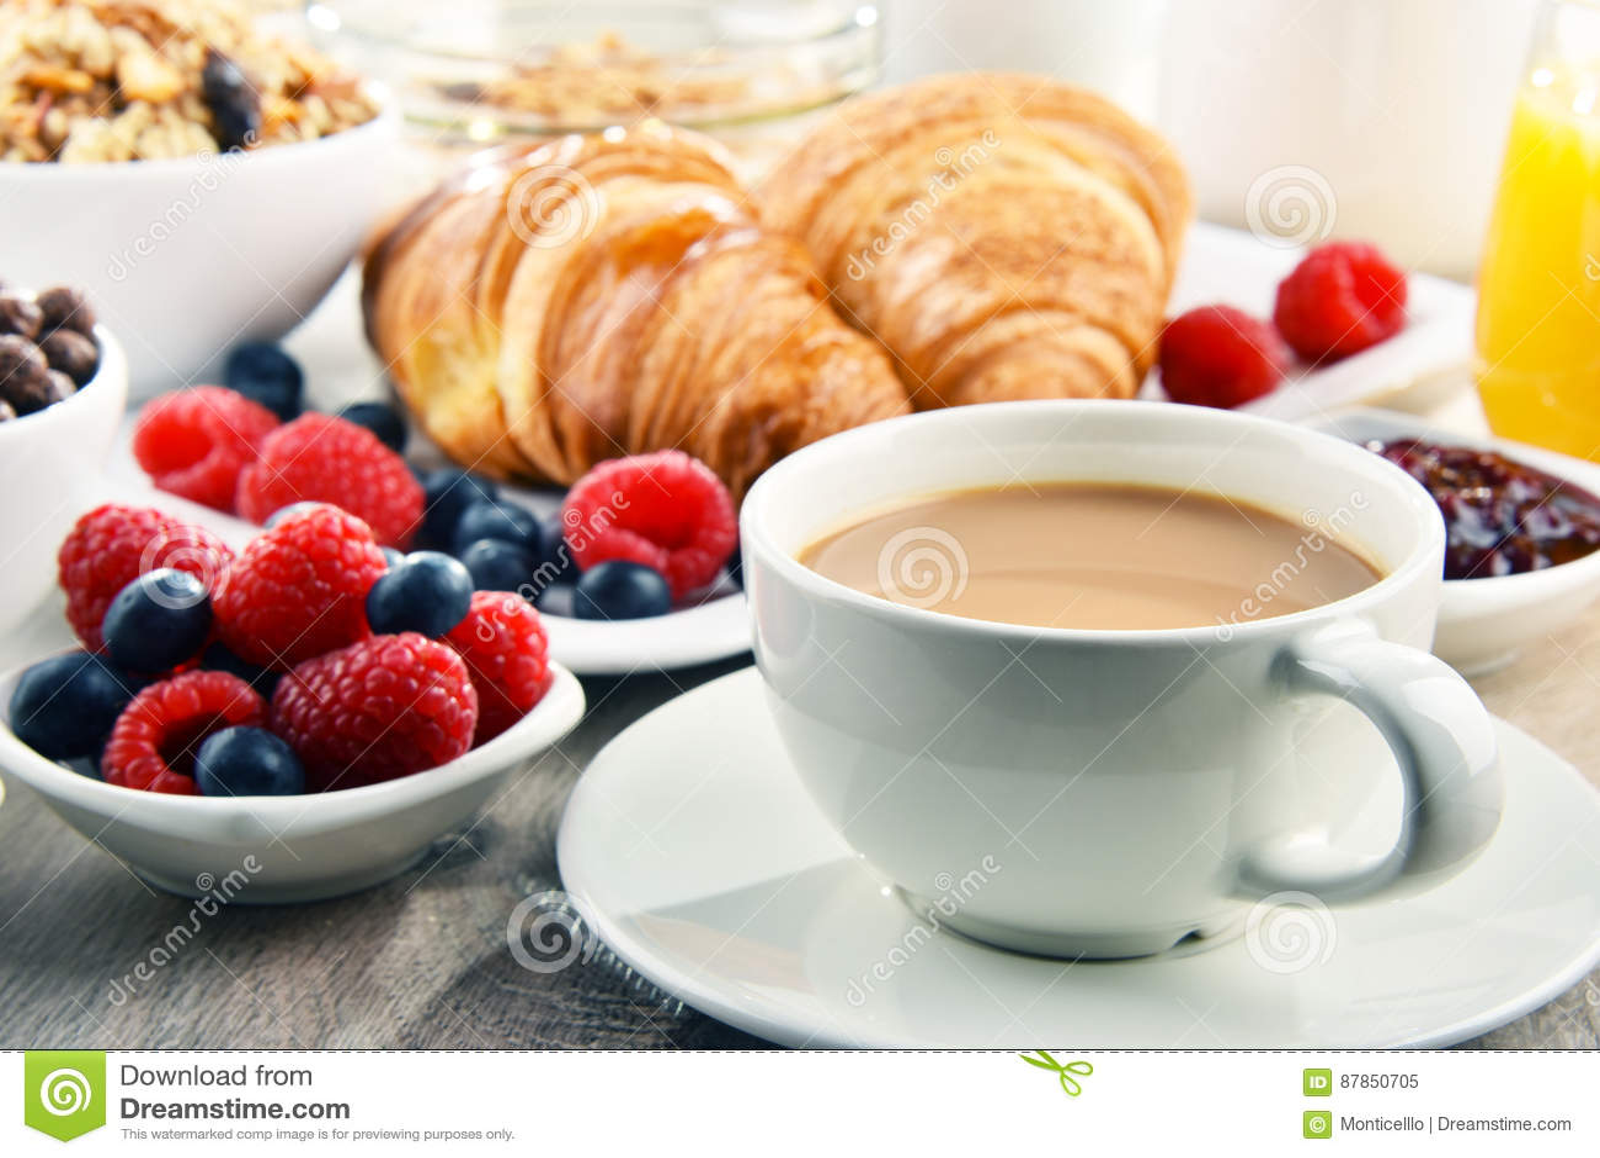 Ontbijt met koffie, sap, croissants en vruchten wordt gediend die